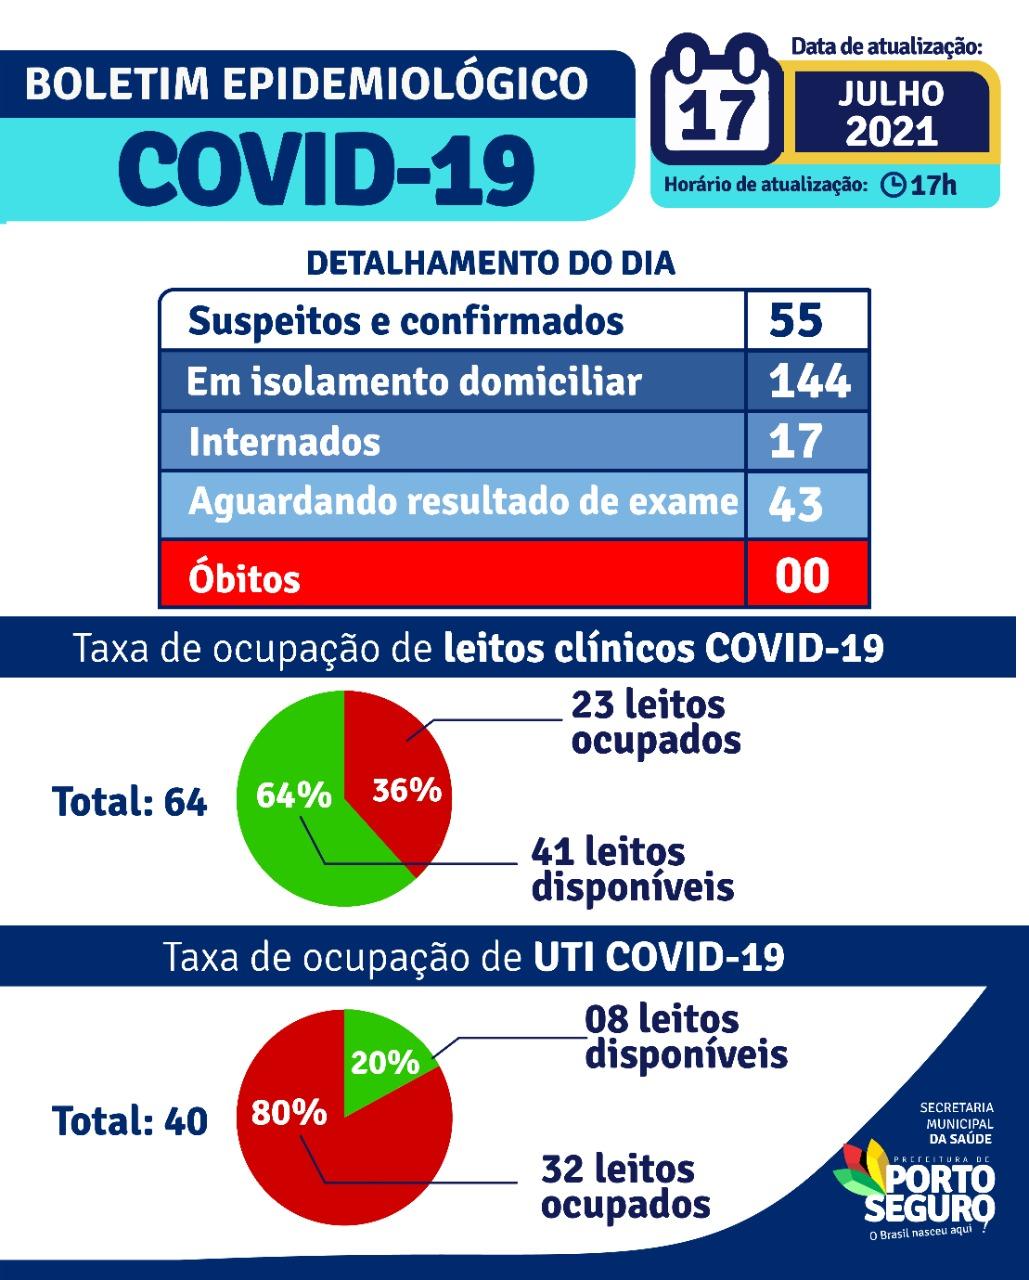 Porto Seguro: Boletim Epidemiológico Covid-19 (17Julho) 22